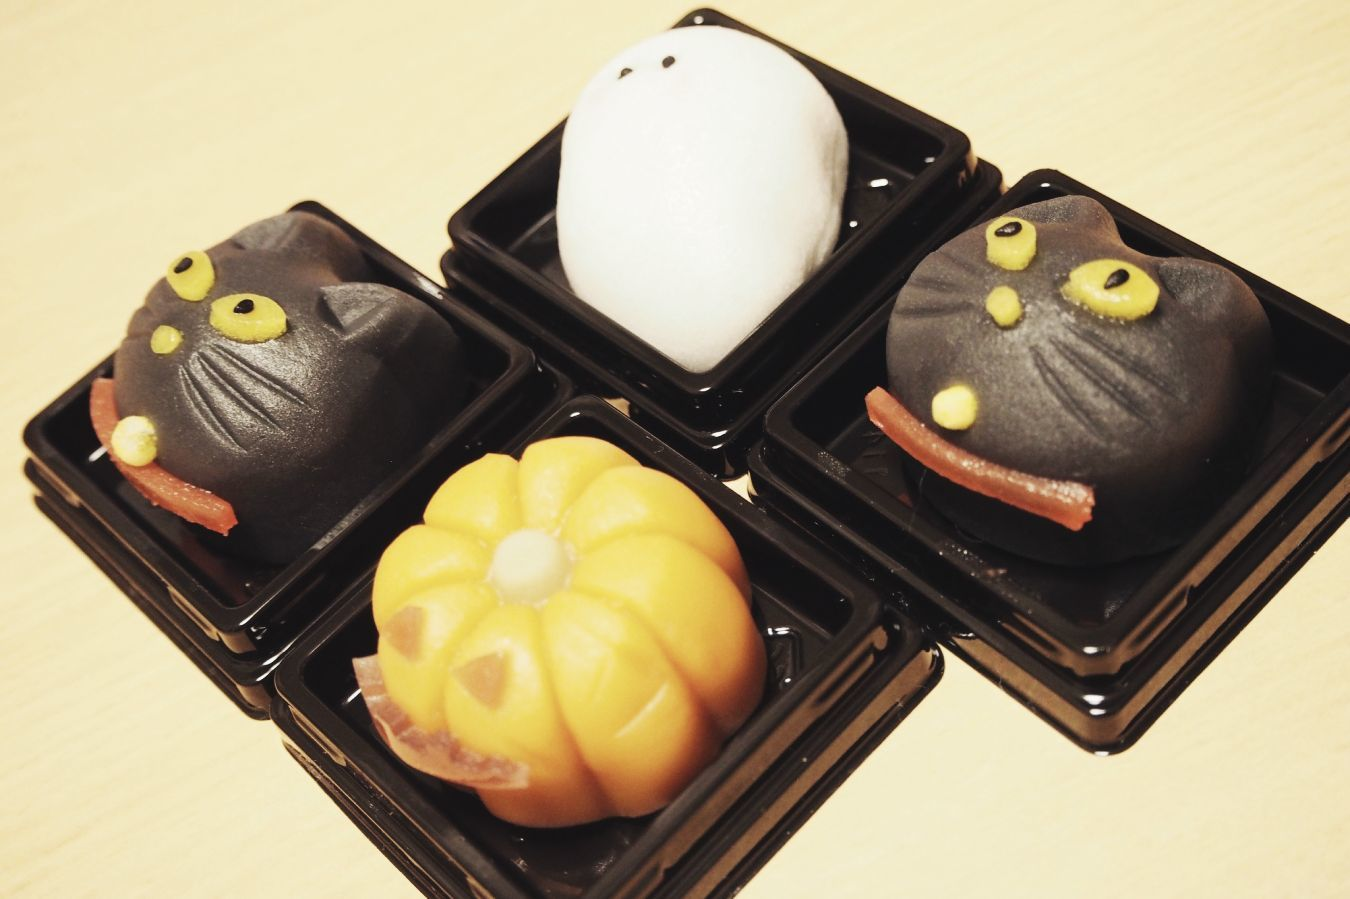 【Photo】ハロウィンは、黒猫_b0008655_19405909.jpg